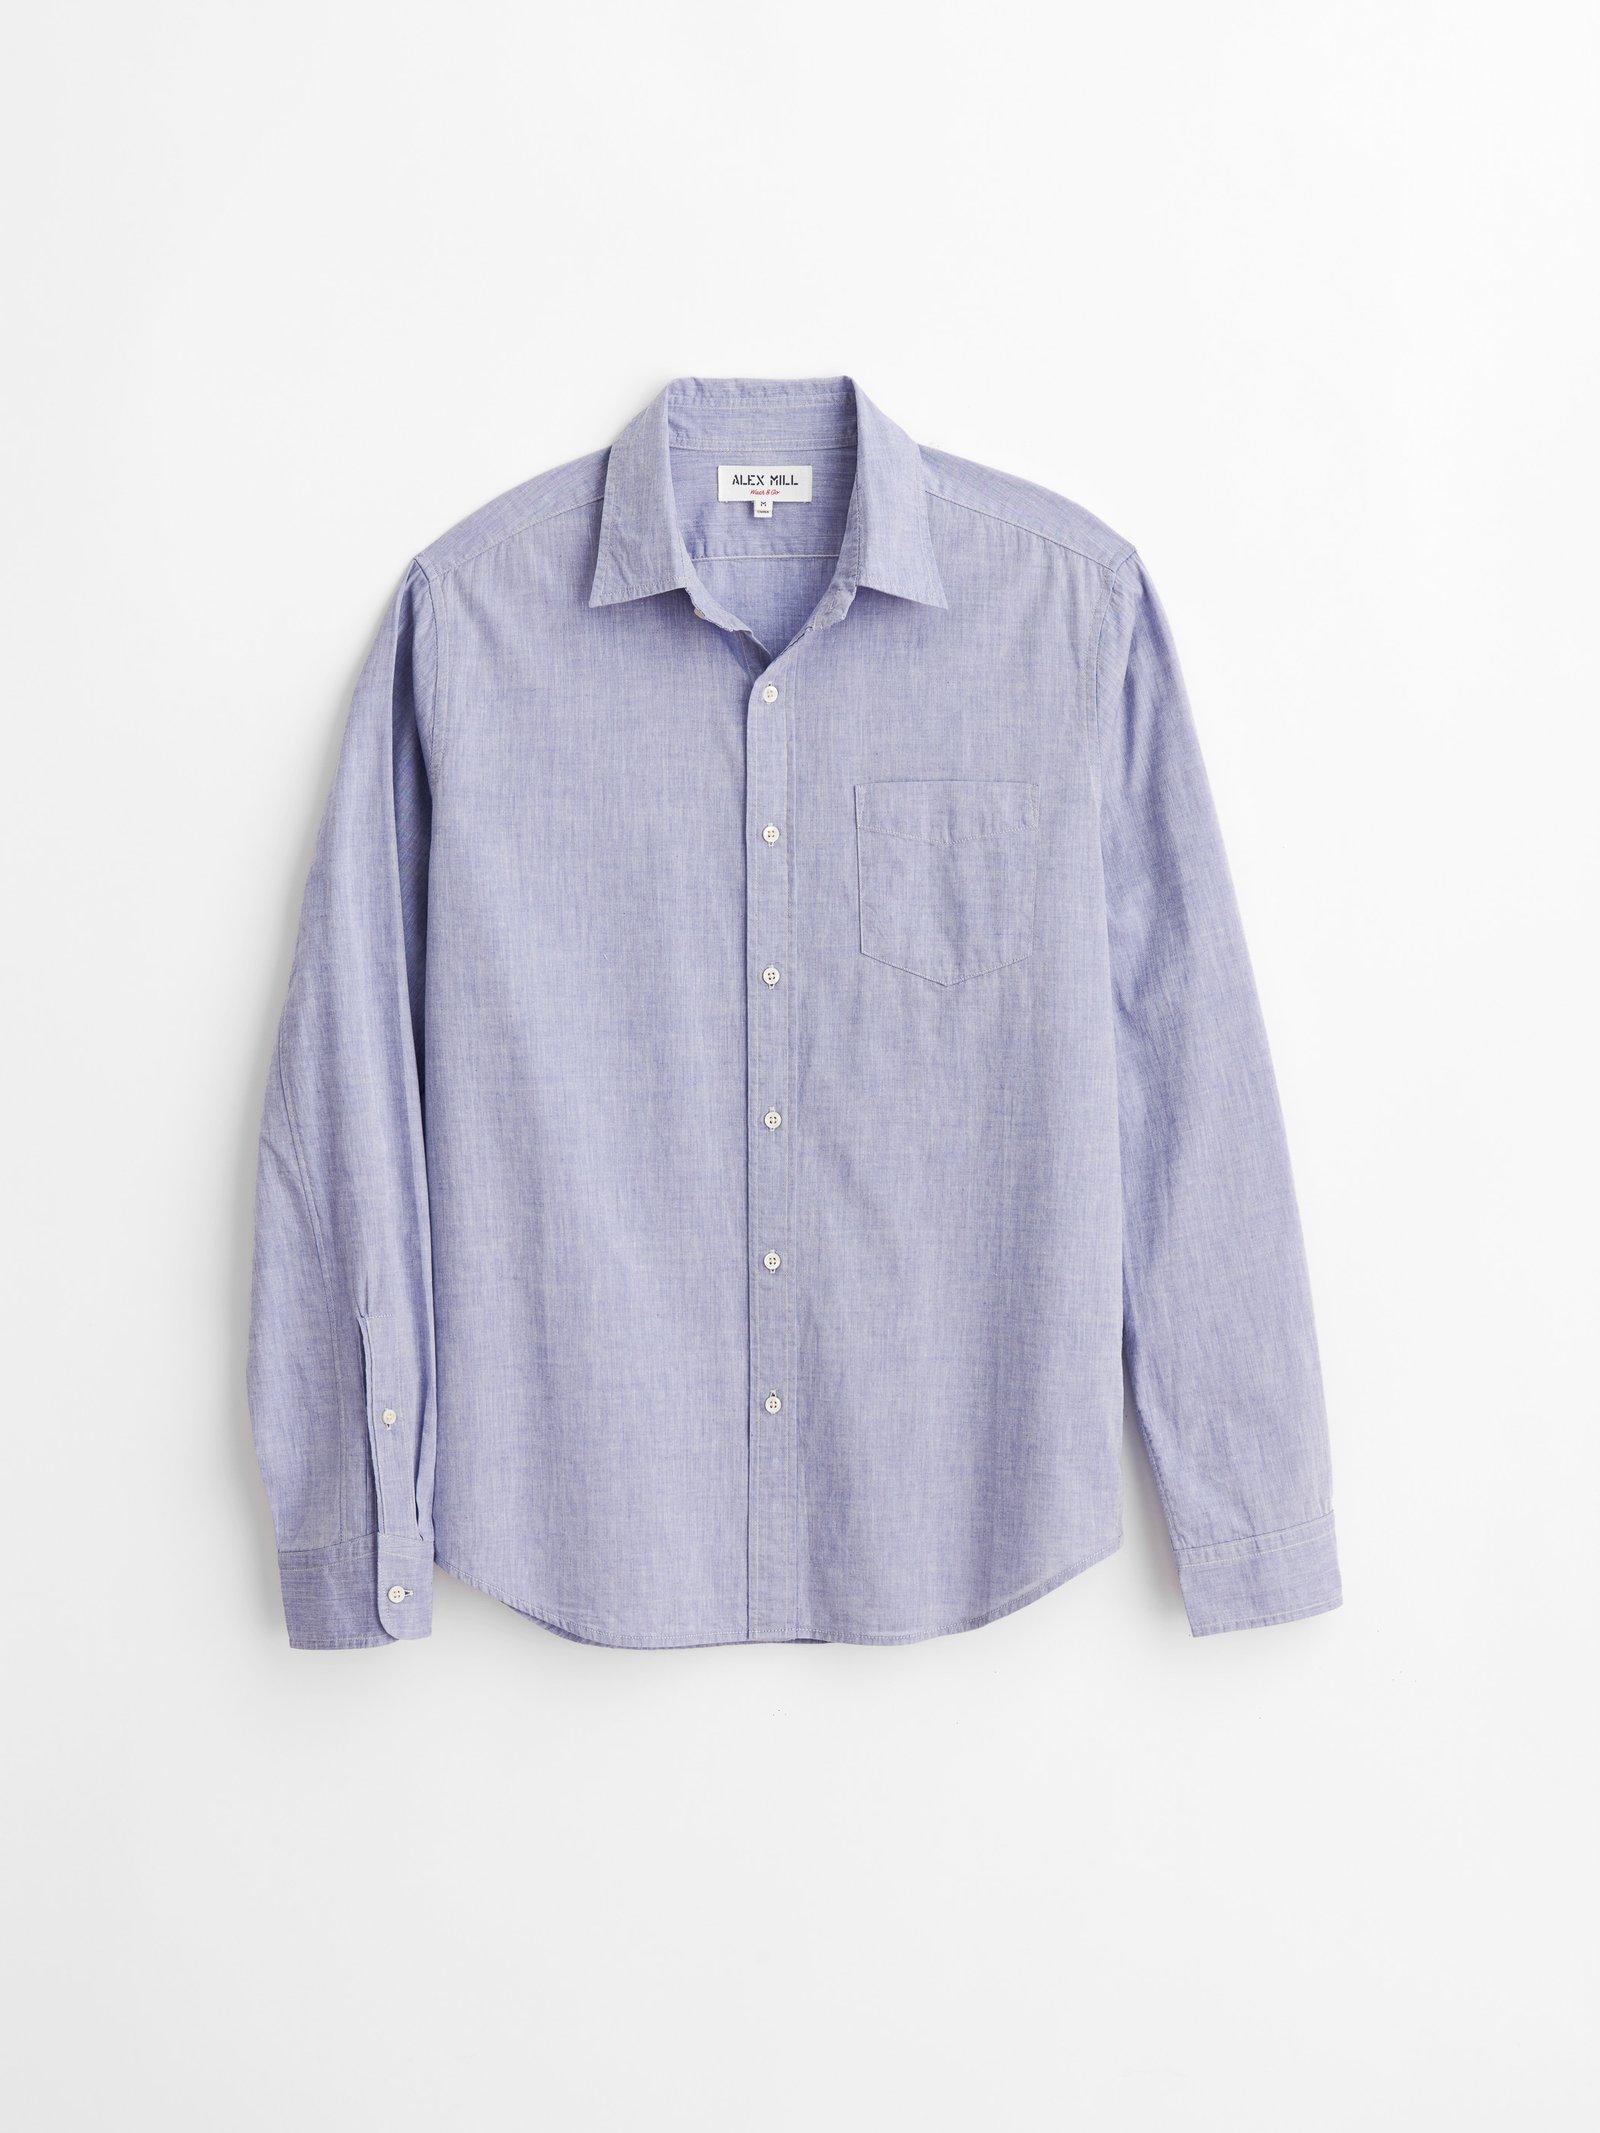 Alex Mill Shirt in Japanese Cotton